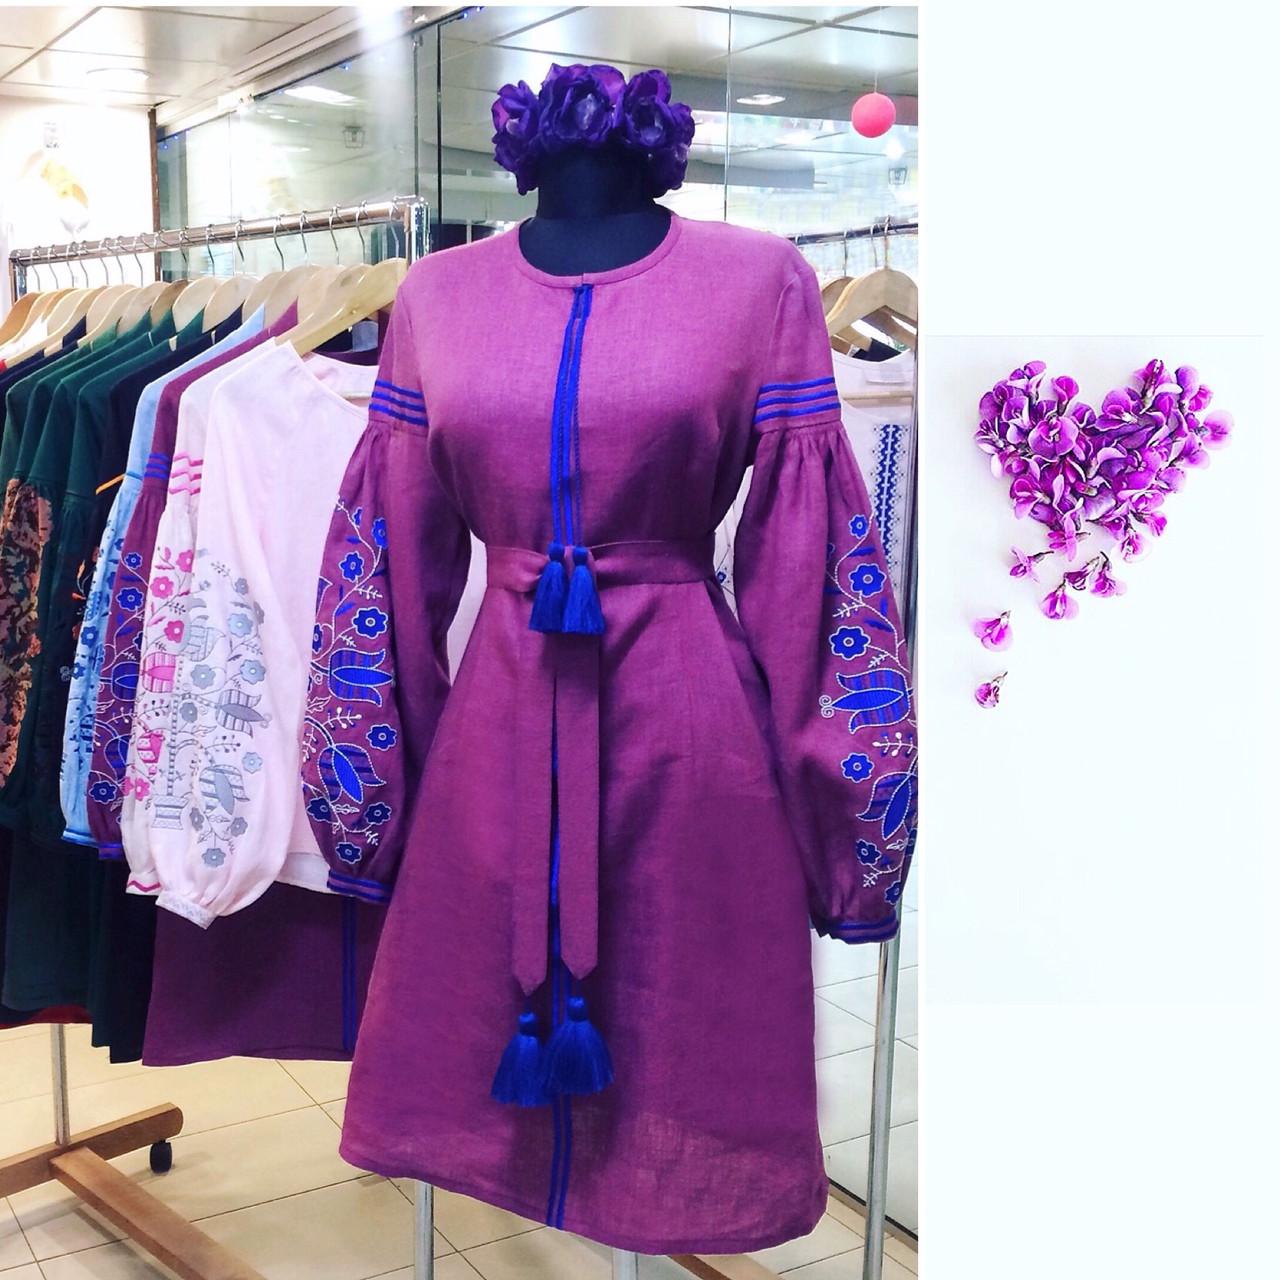 Платье цвет года вышивка дерево - Ексклюзивні Вишиванки  502291accd122